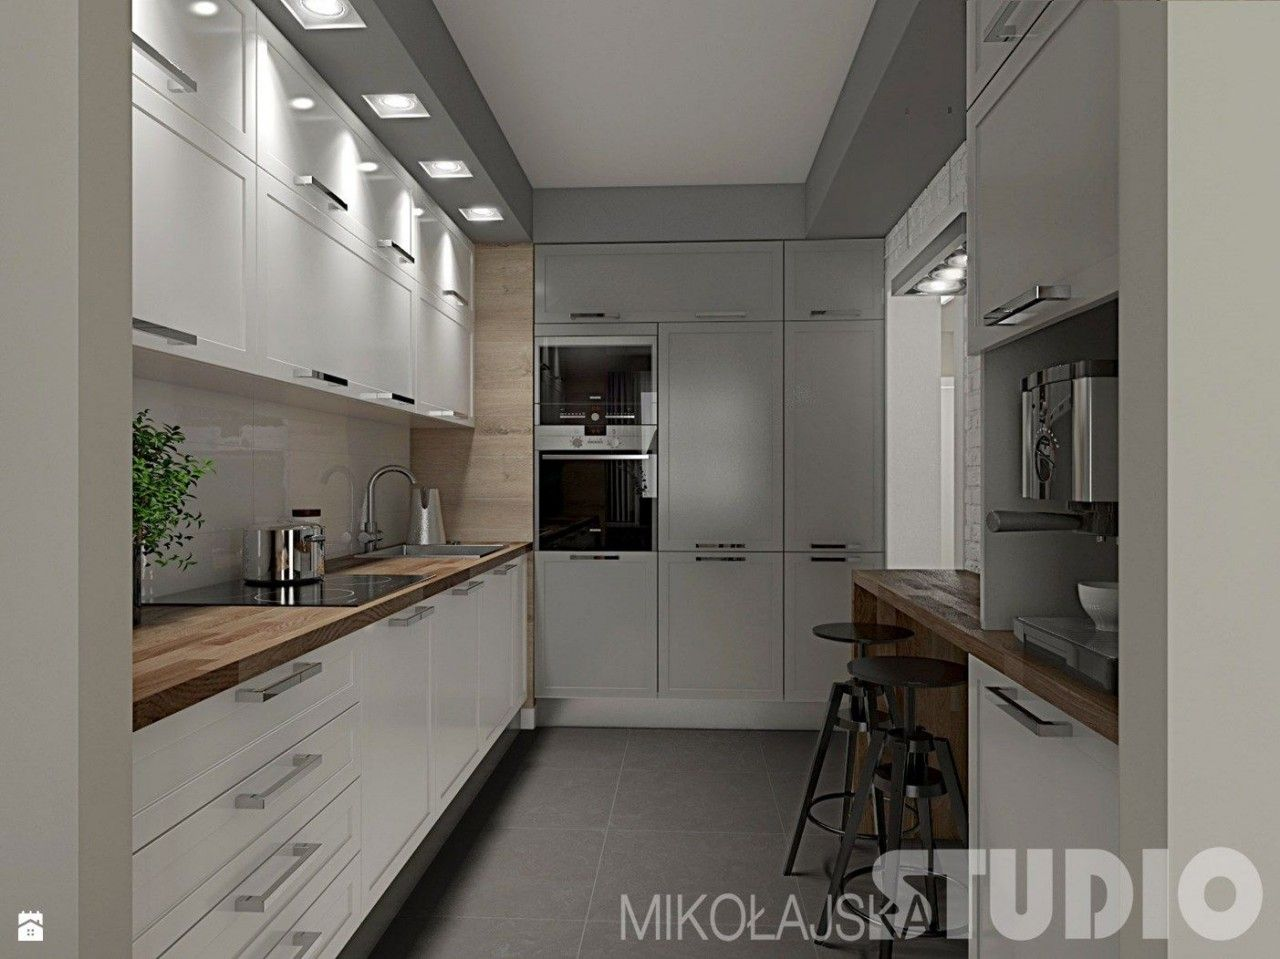 28 Cocinas Integrales Blancas Modernas 2019 Kitchen Decor Beautiful Kitchen Cabinets Home Kitchens